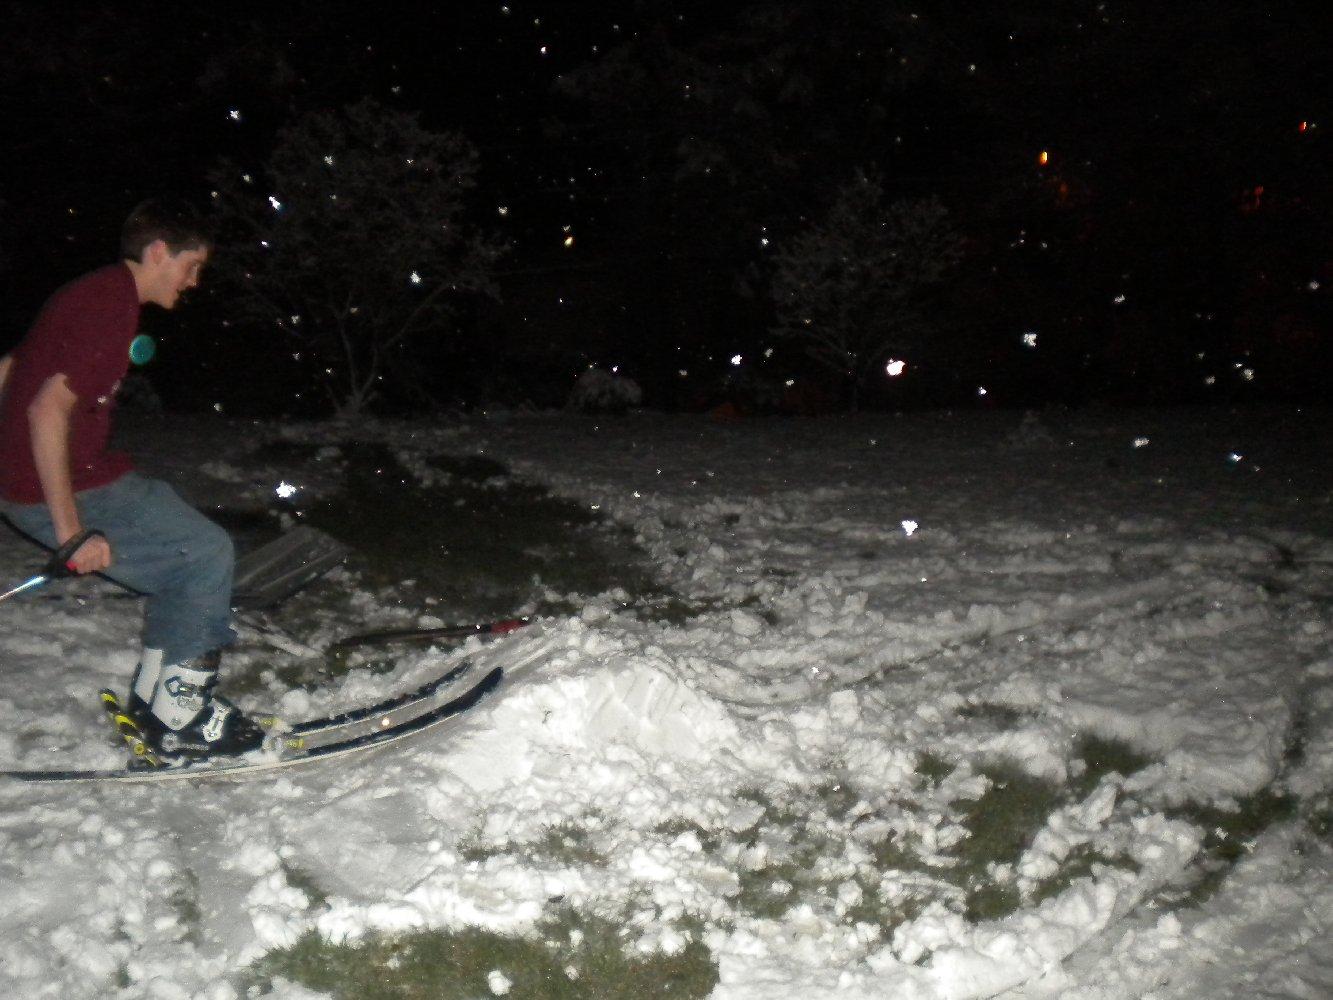 Backyard Skiing on April 18th - 15 of 27